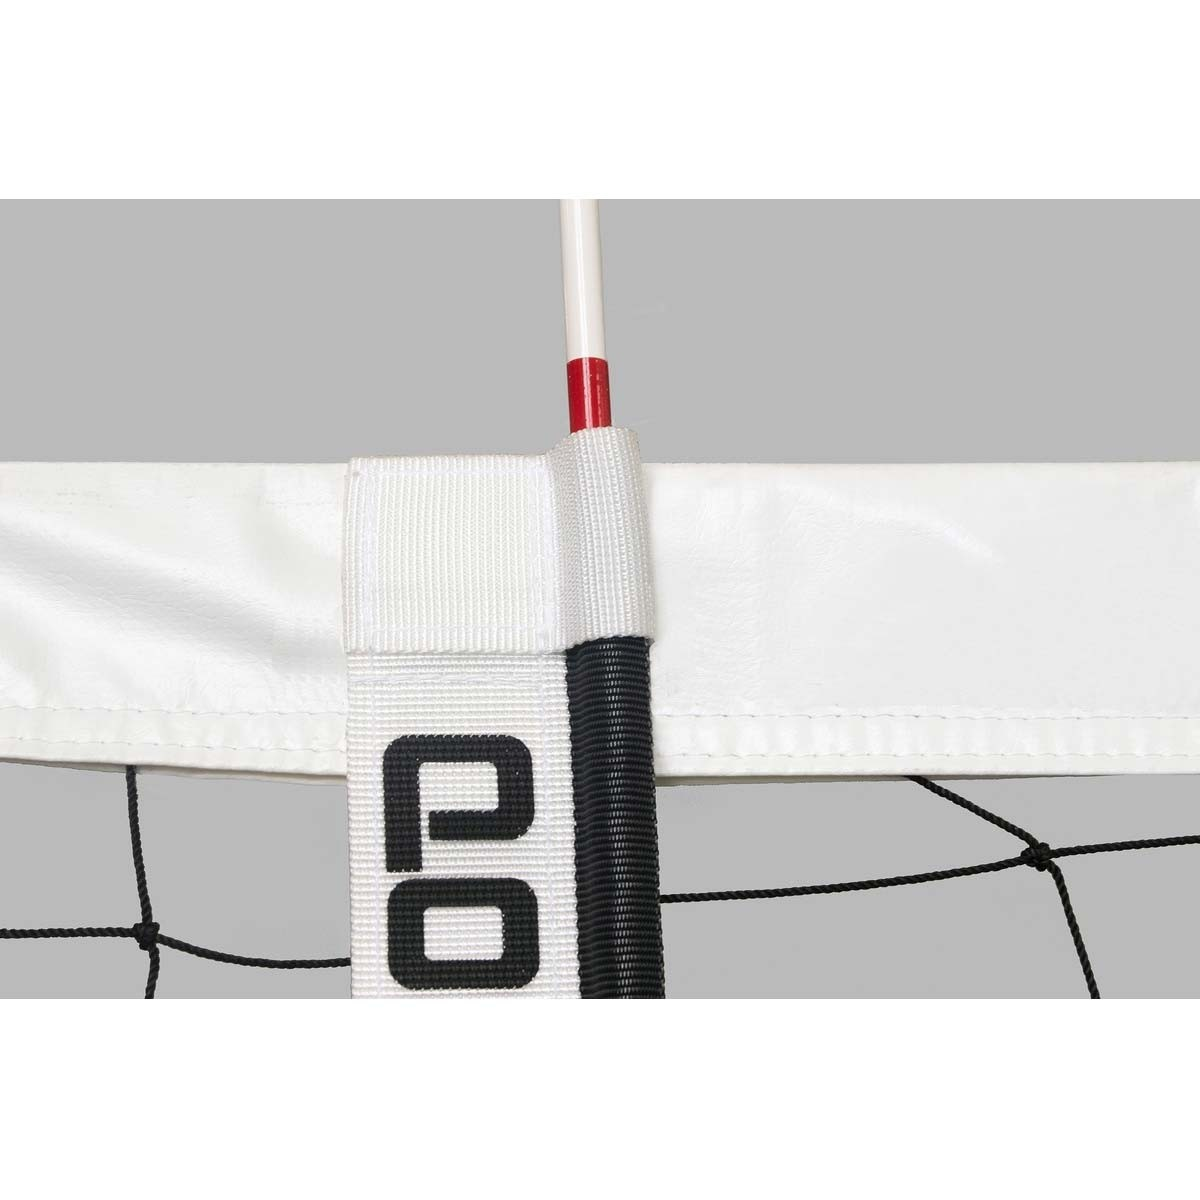 Porter Powr Line Volleyball Net Boundary Marker W Antenna